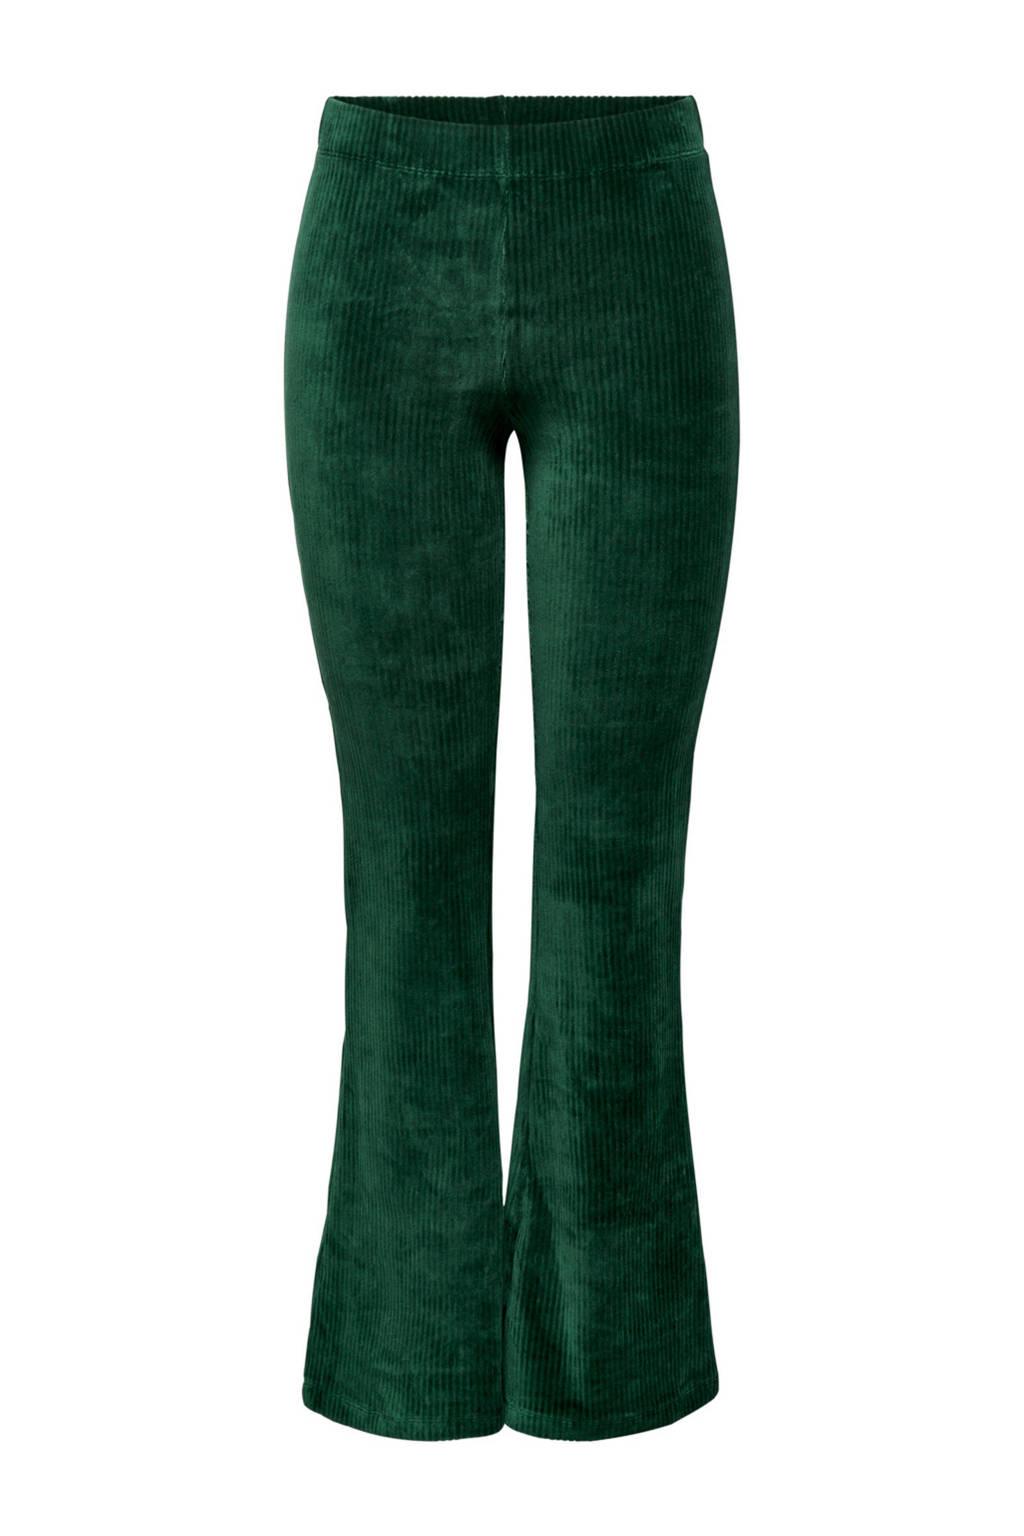 ONLY flared broek groen, Groen